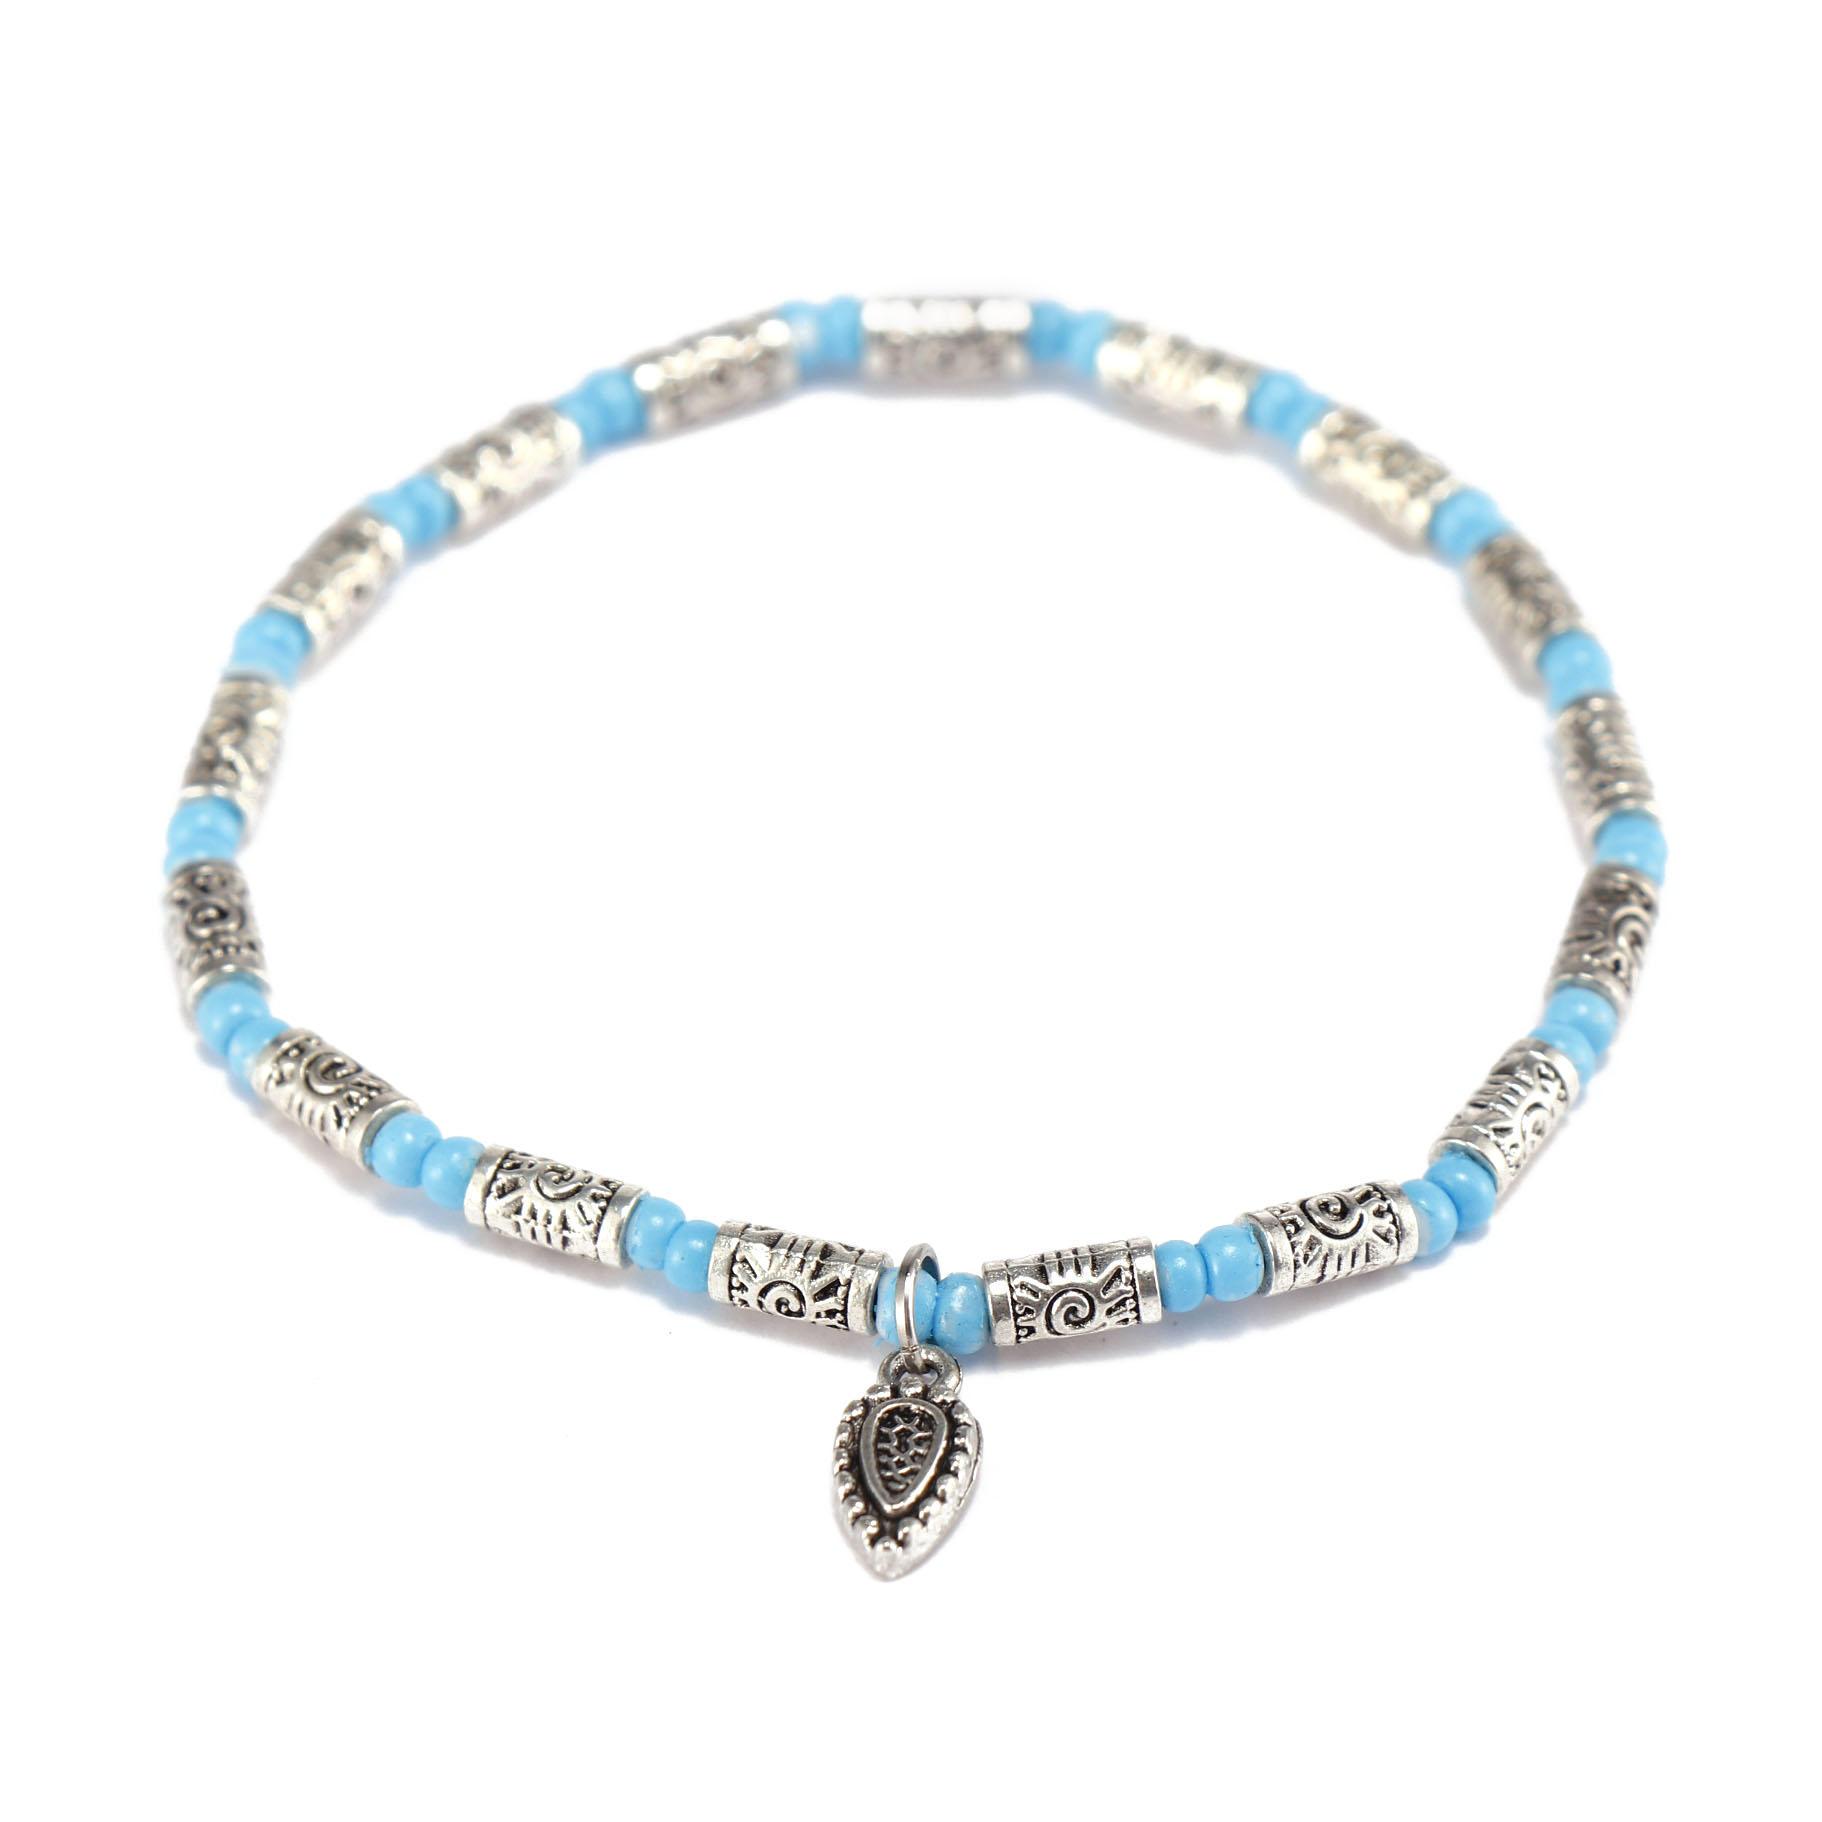 Handmade Seed Bead Alloy Charms Bracelet